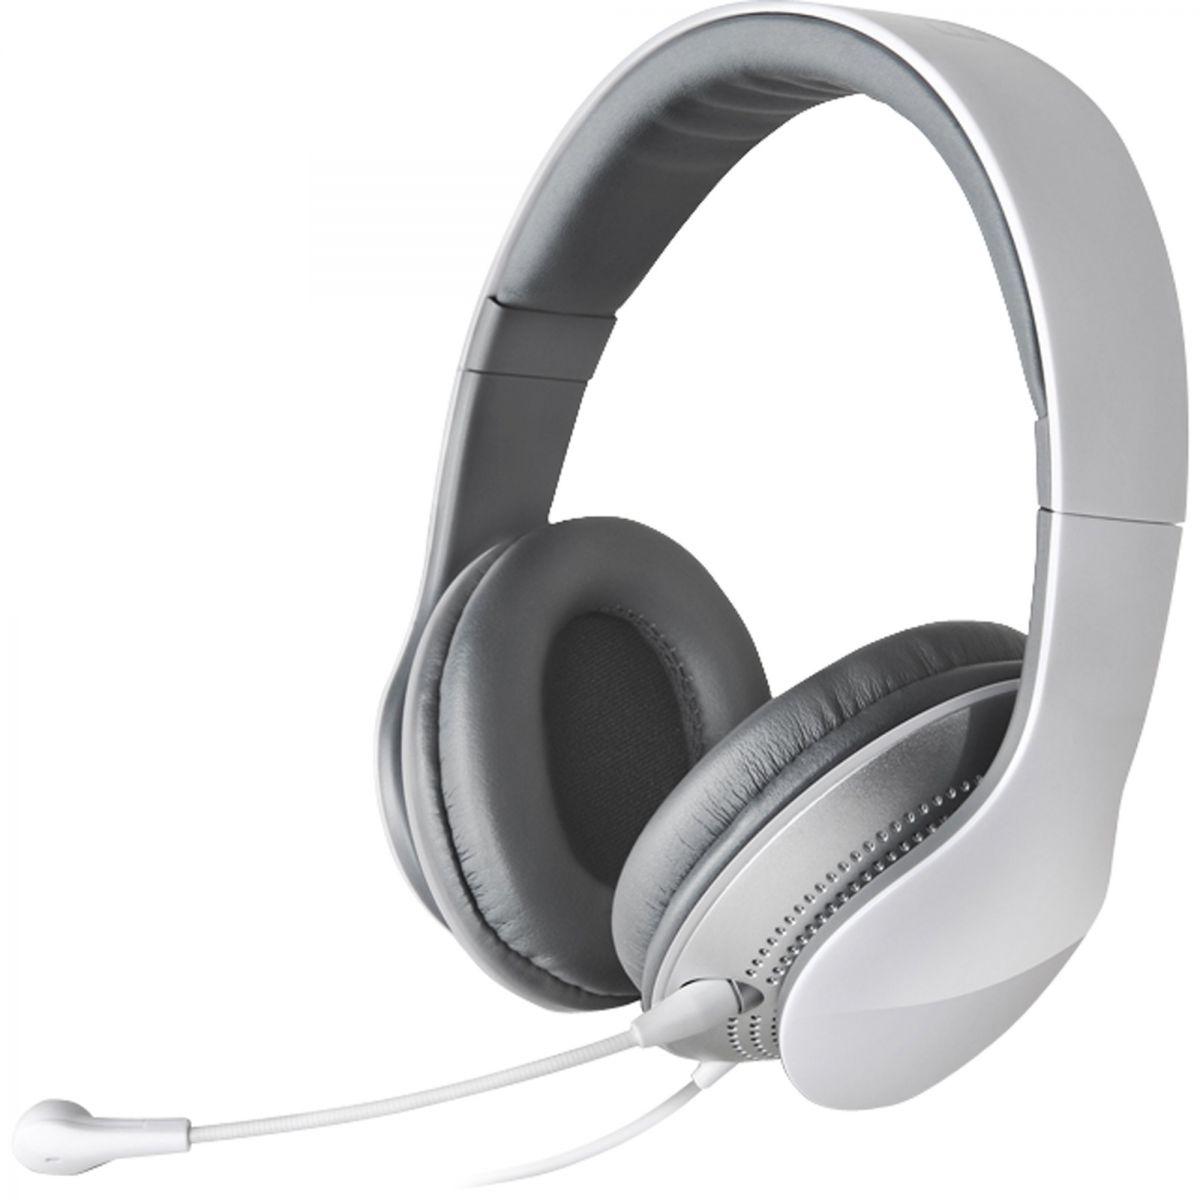 Edifier K830 Fone com Microfone, Headset Gamer, Branco e Cinza